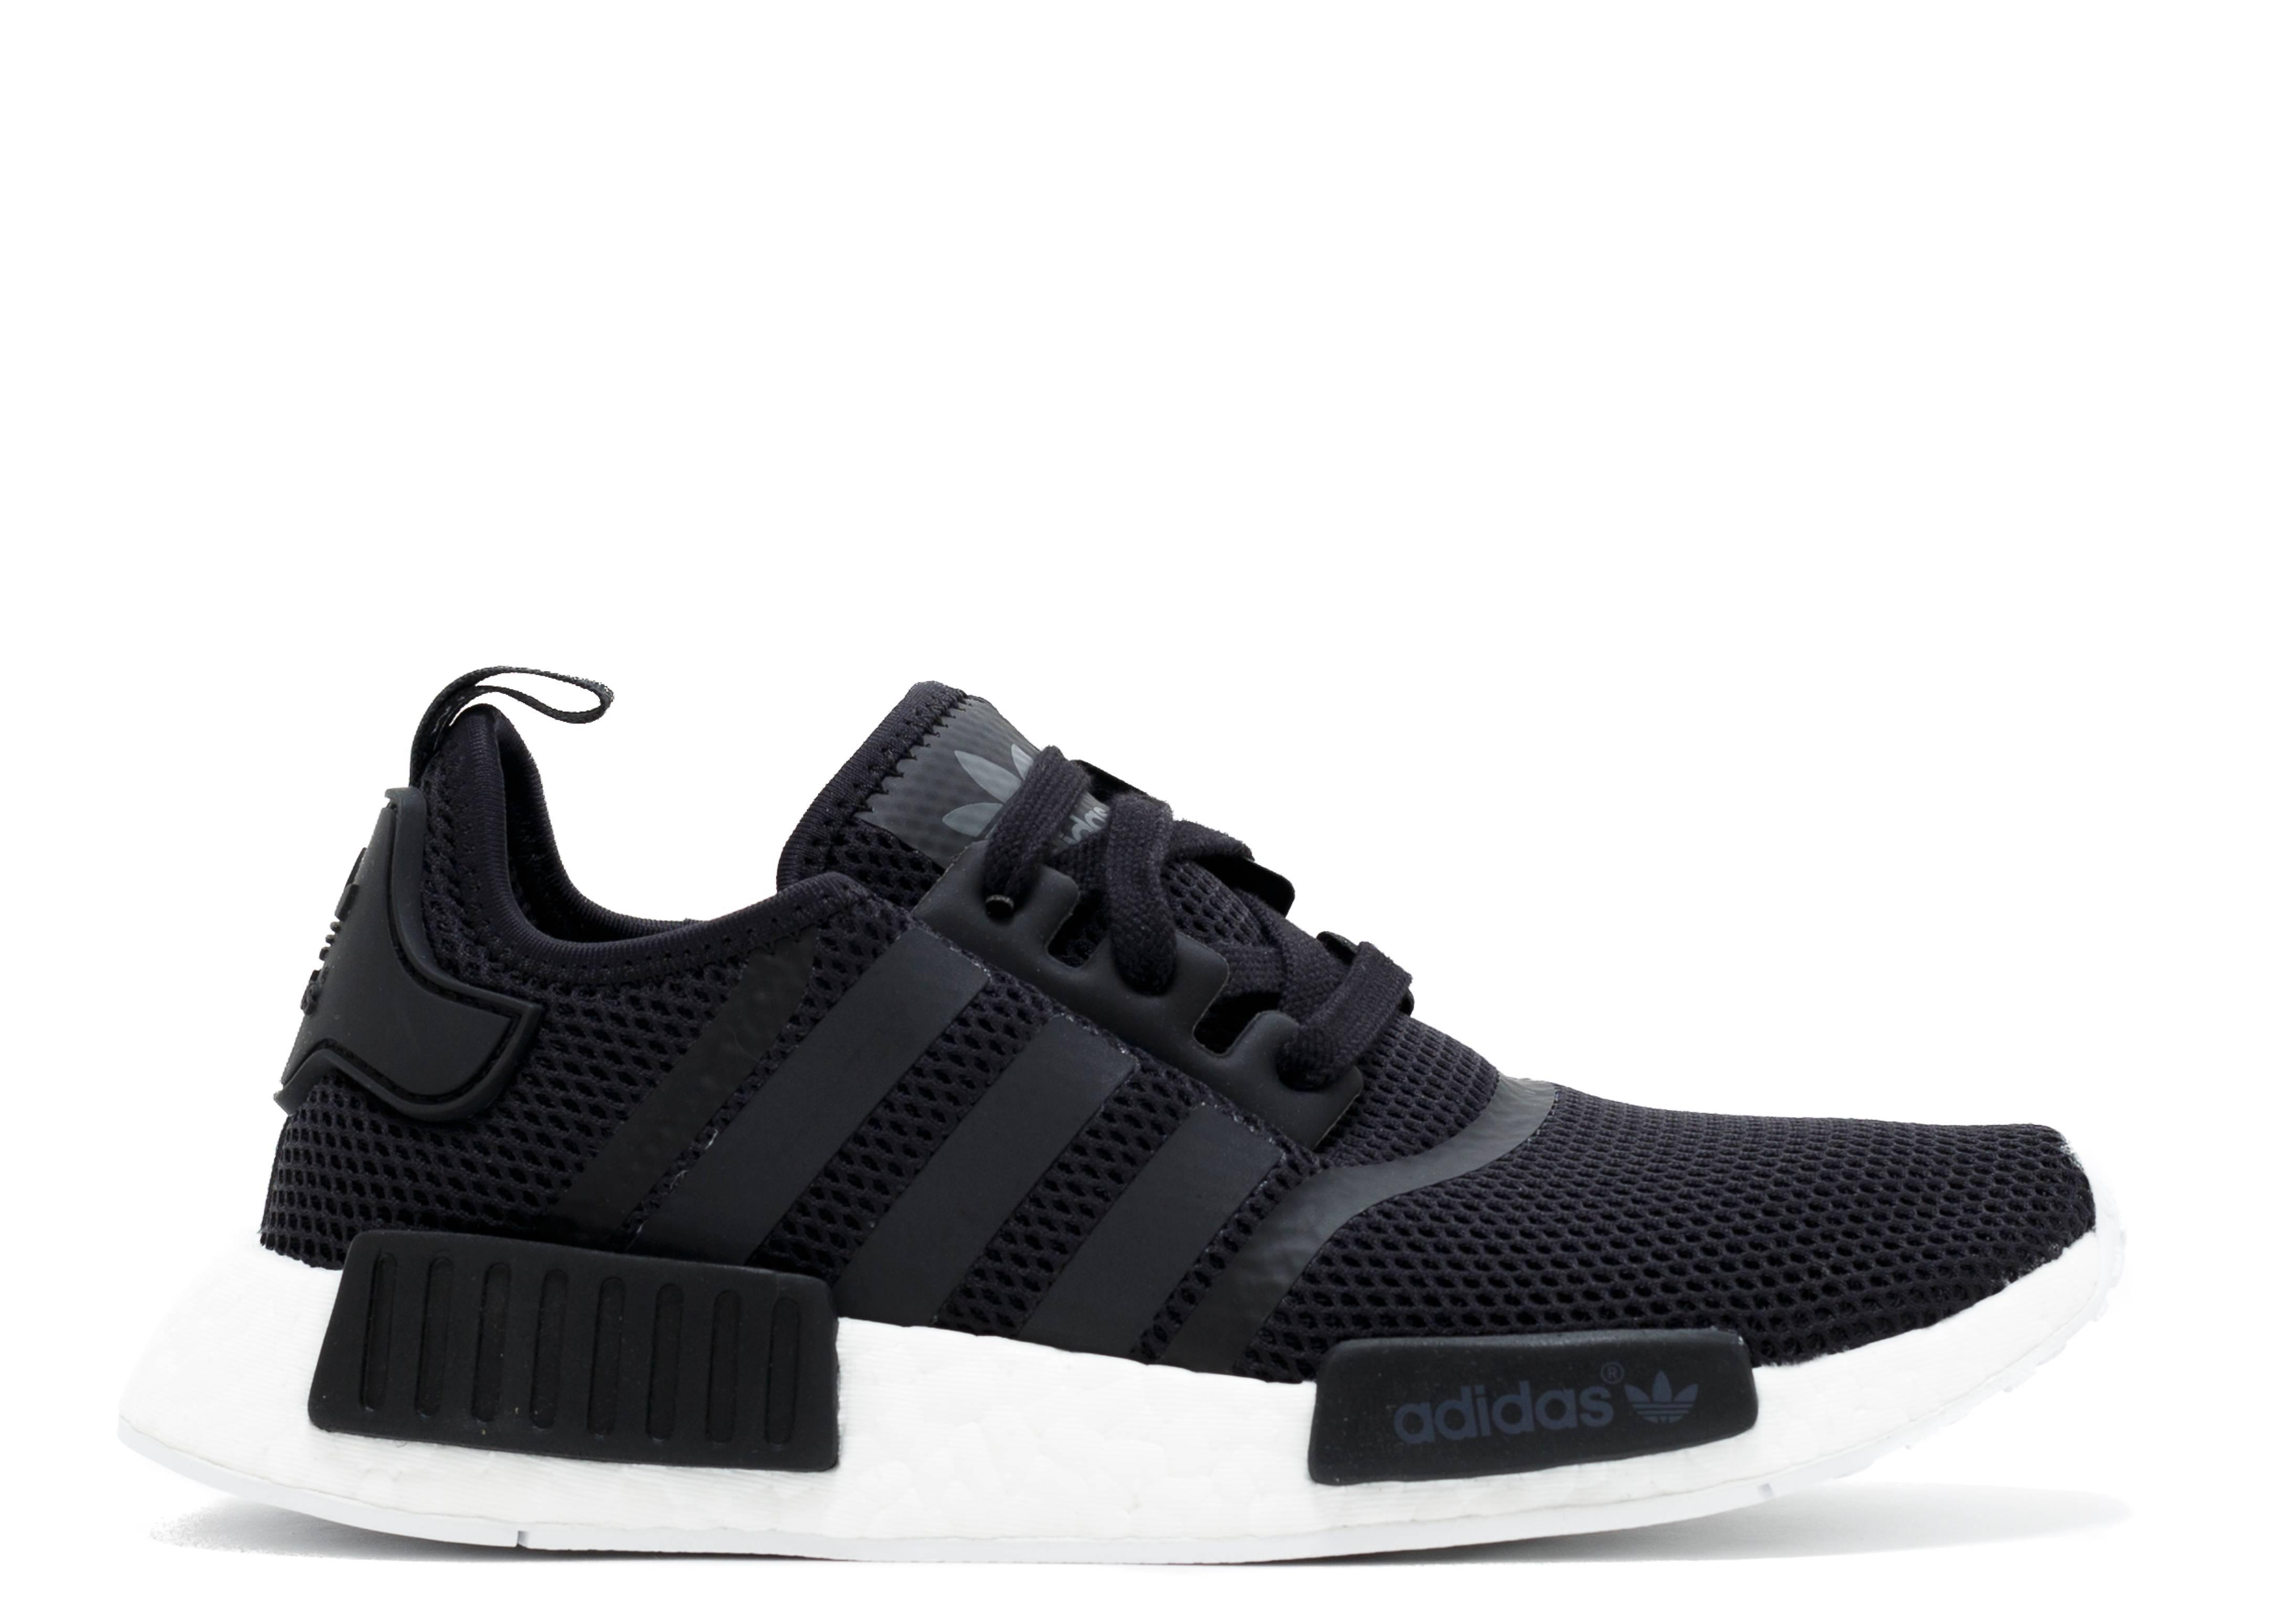 13b2cceced798 Nmd R1 - Adidas - s79165 - black white